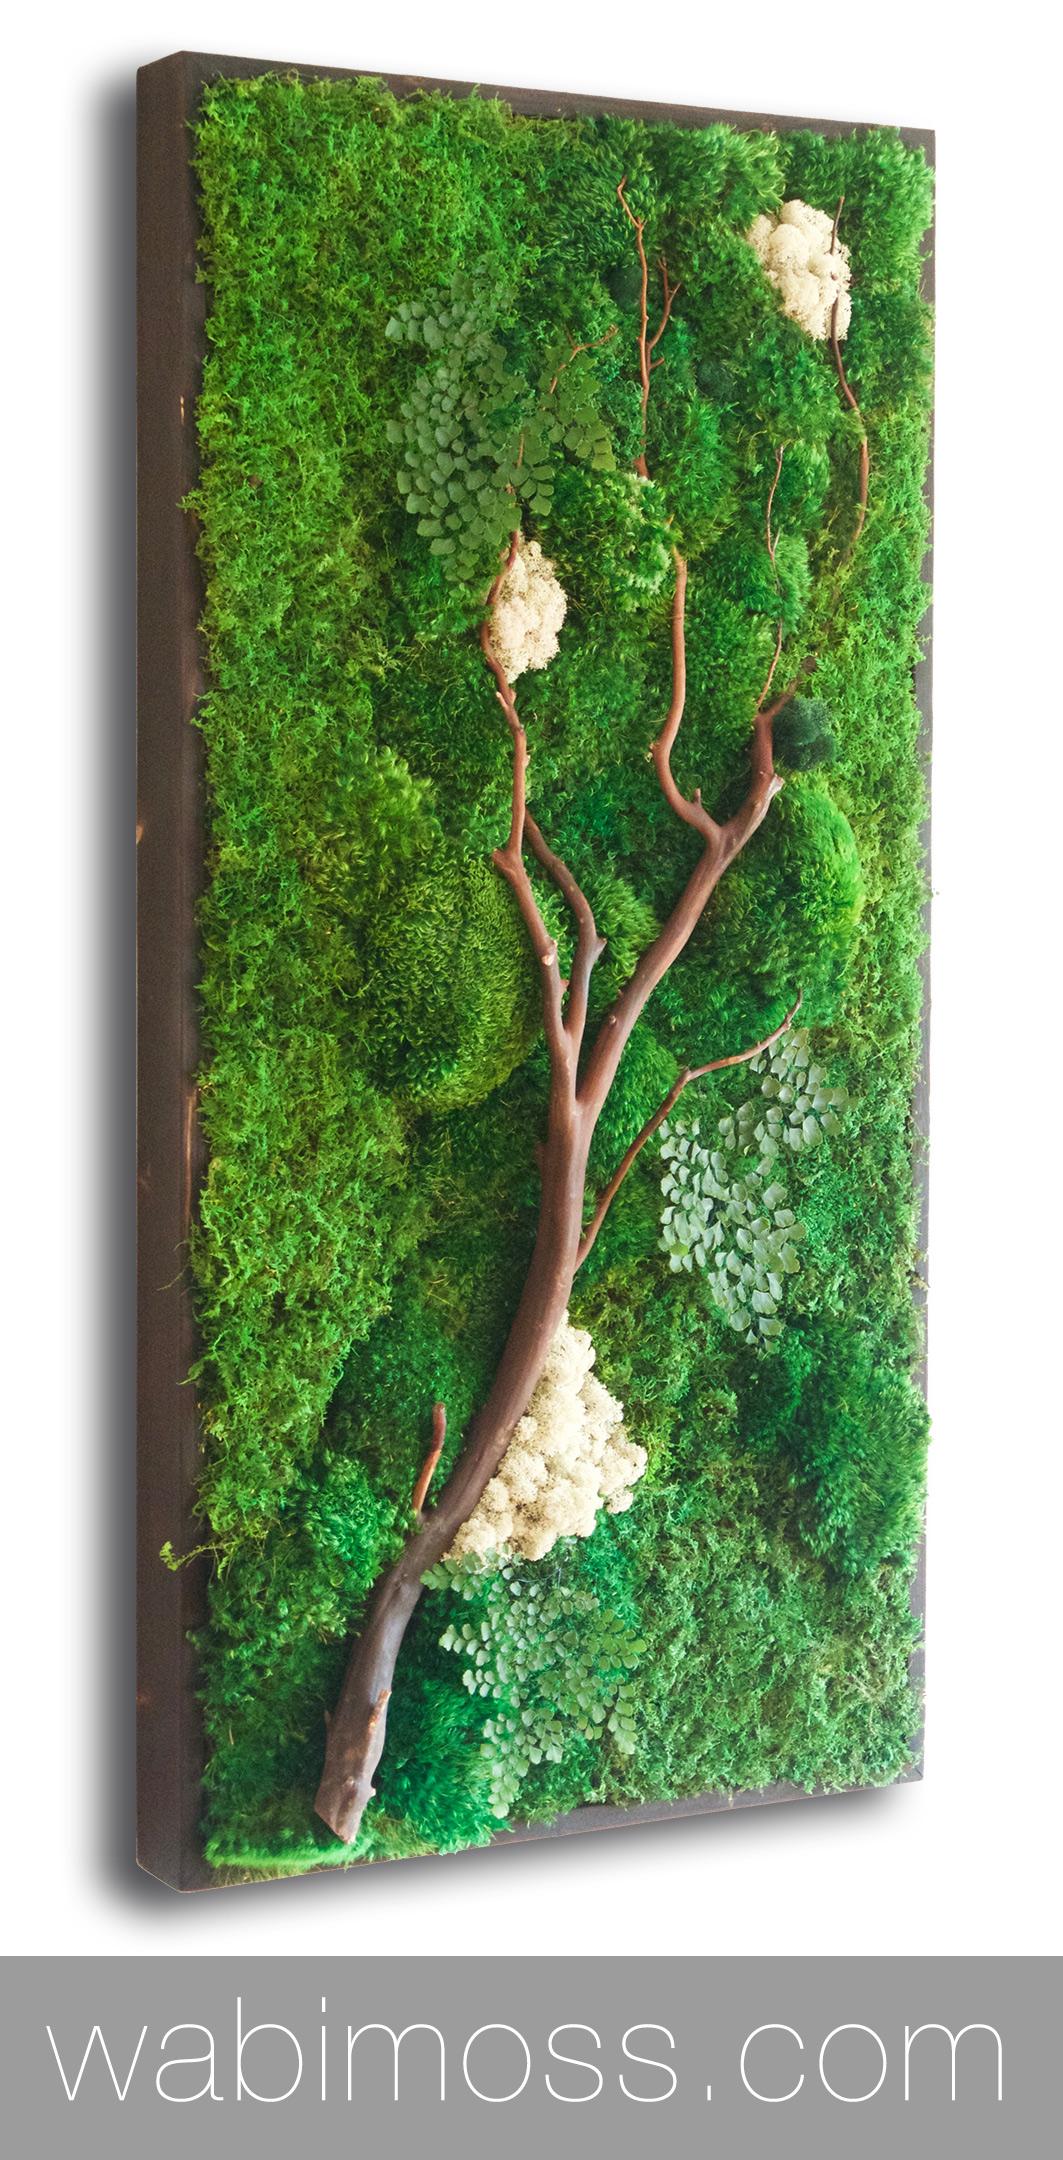 Moss Wall Art 36x18 With Manzanita Branches Wabimoss